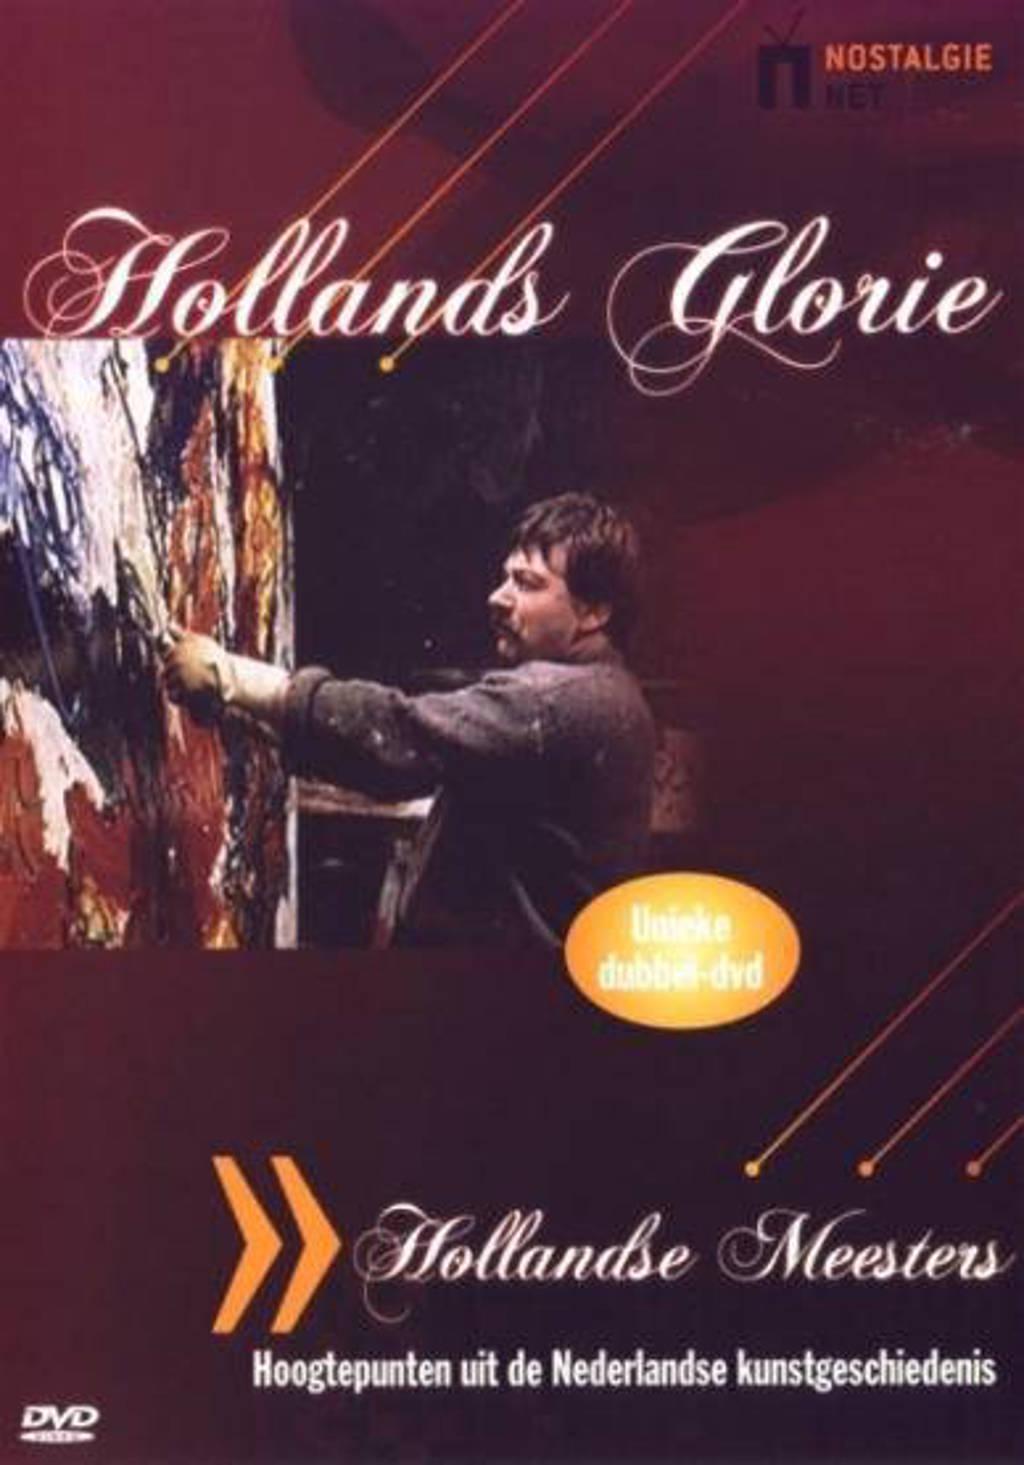 Hollands glorie-Hollandse meesters (DVD)